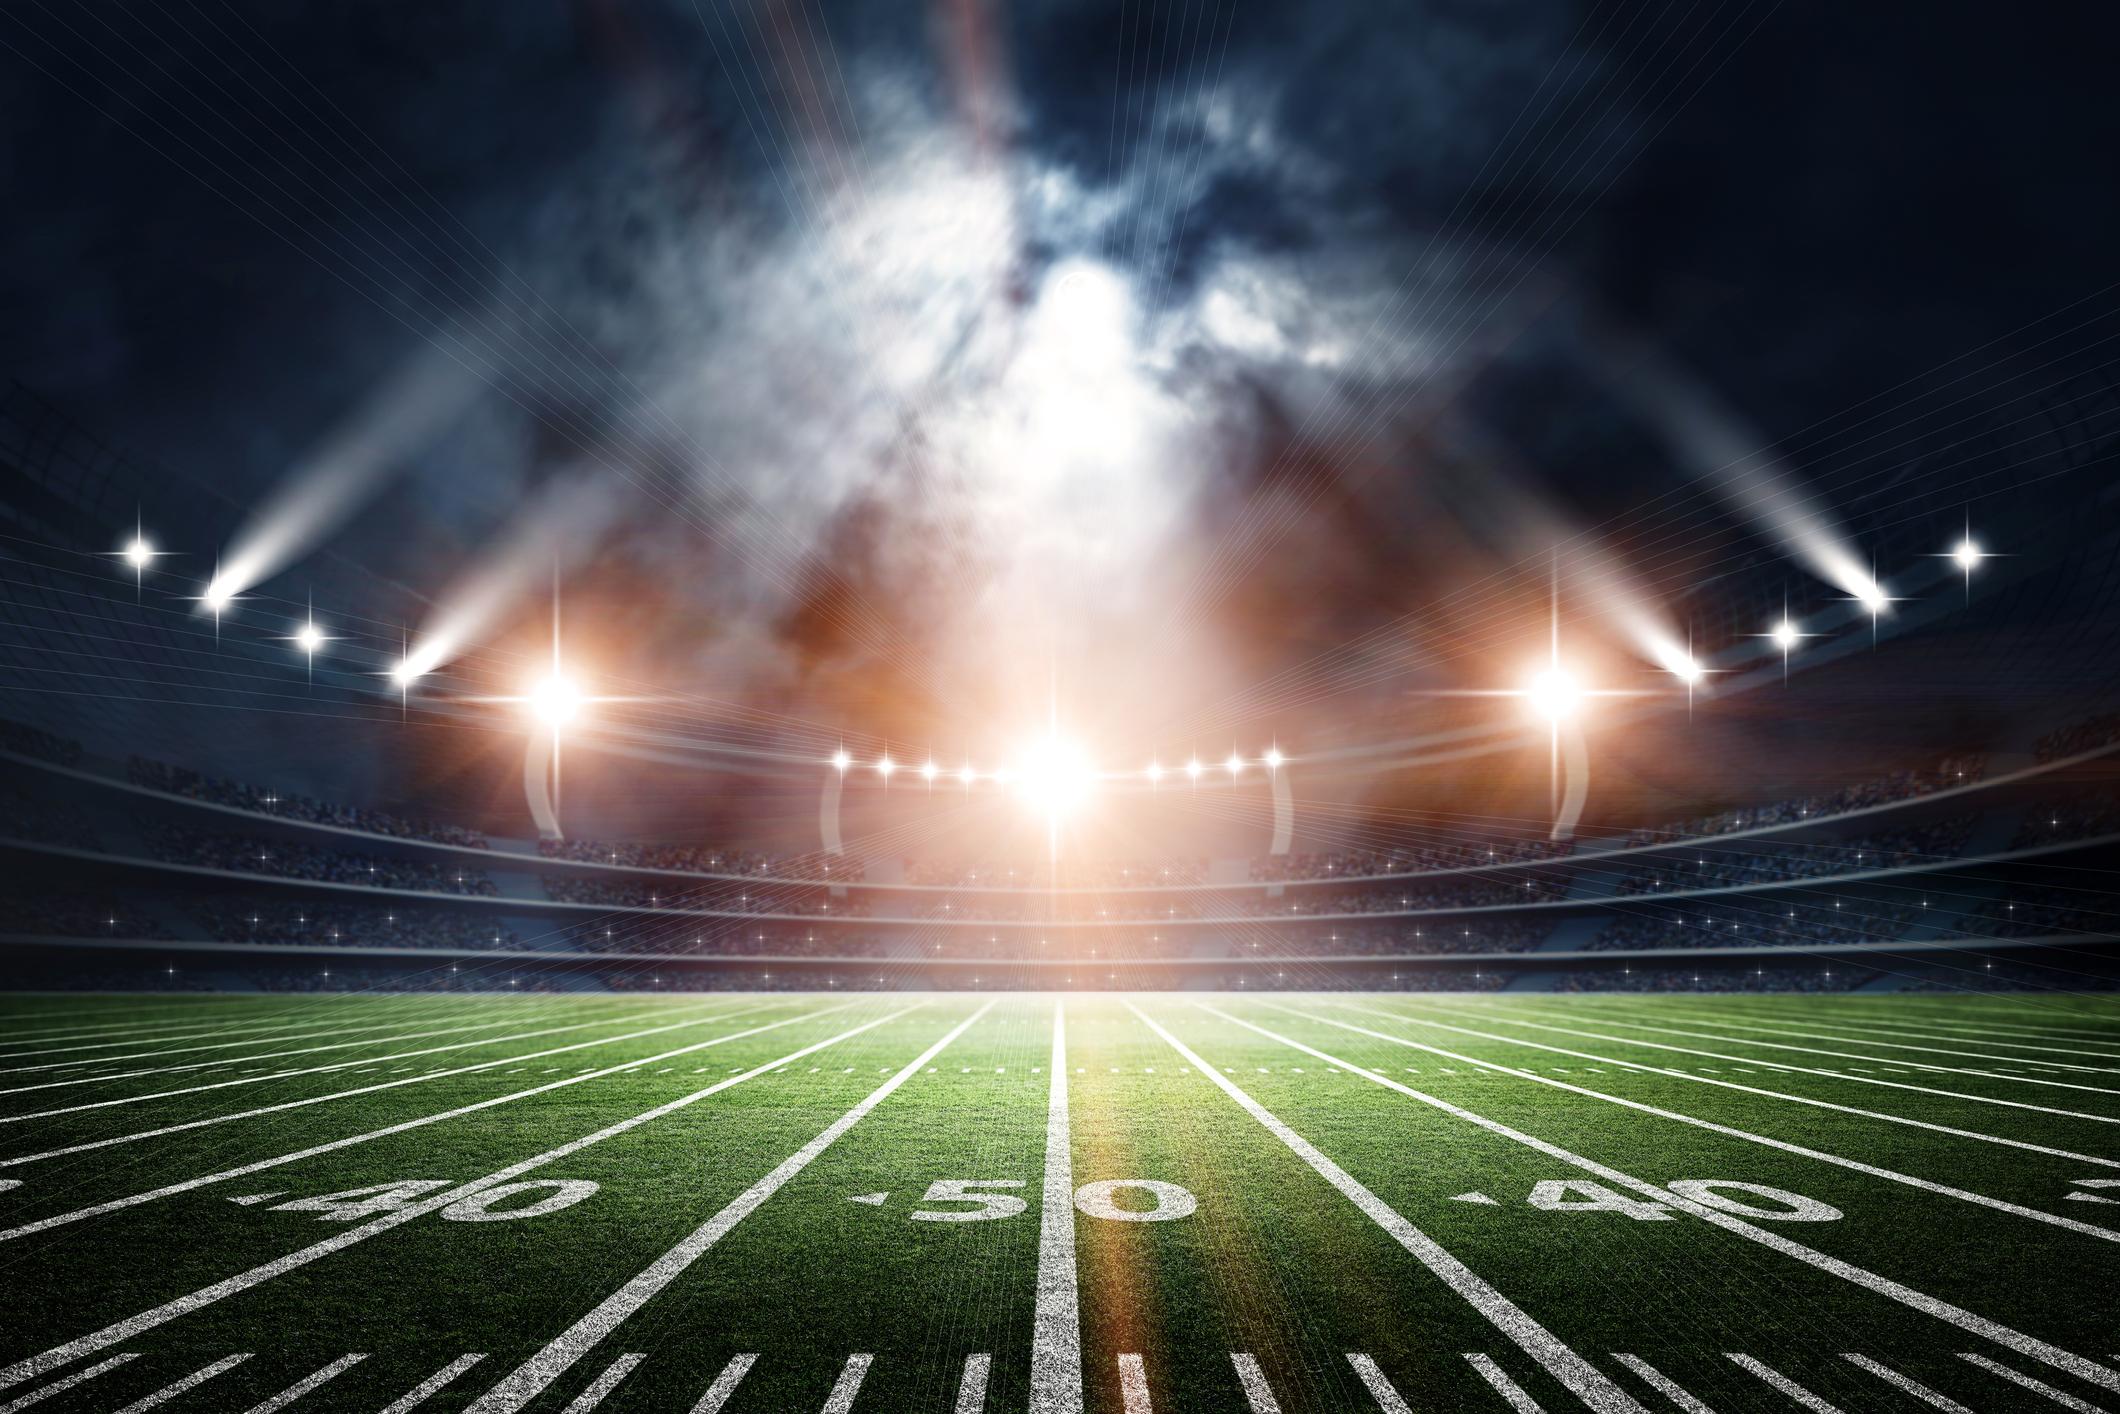 Sporting Stadiums